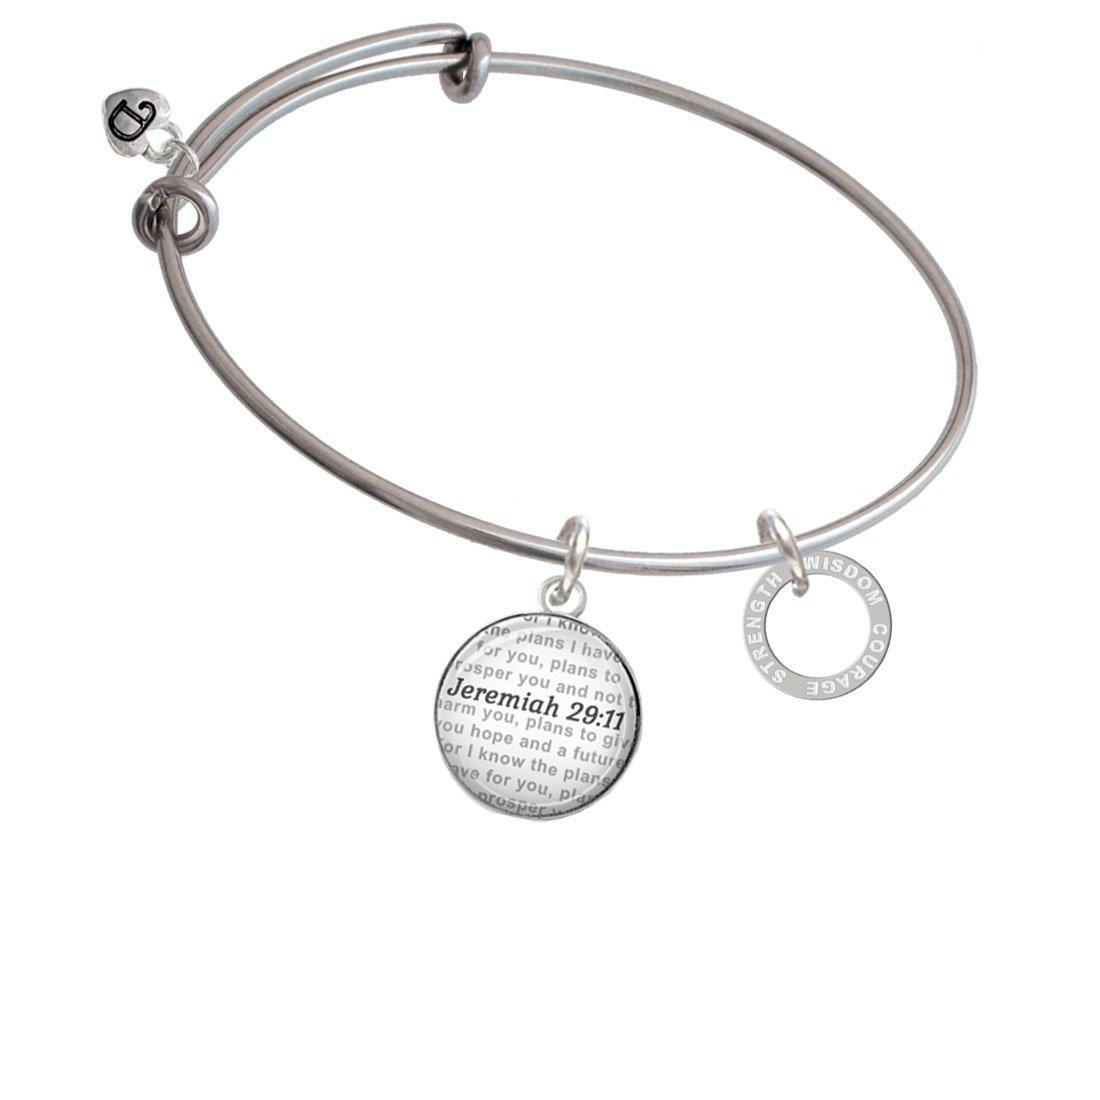 Bible Verse Jeremiah 29:11 Glass Dome Bangle Bracelet Silvertone Courage Strength Wisdom Infinity Ring